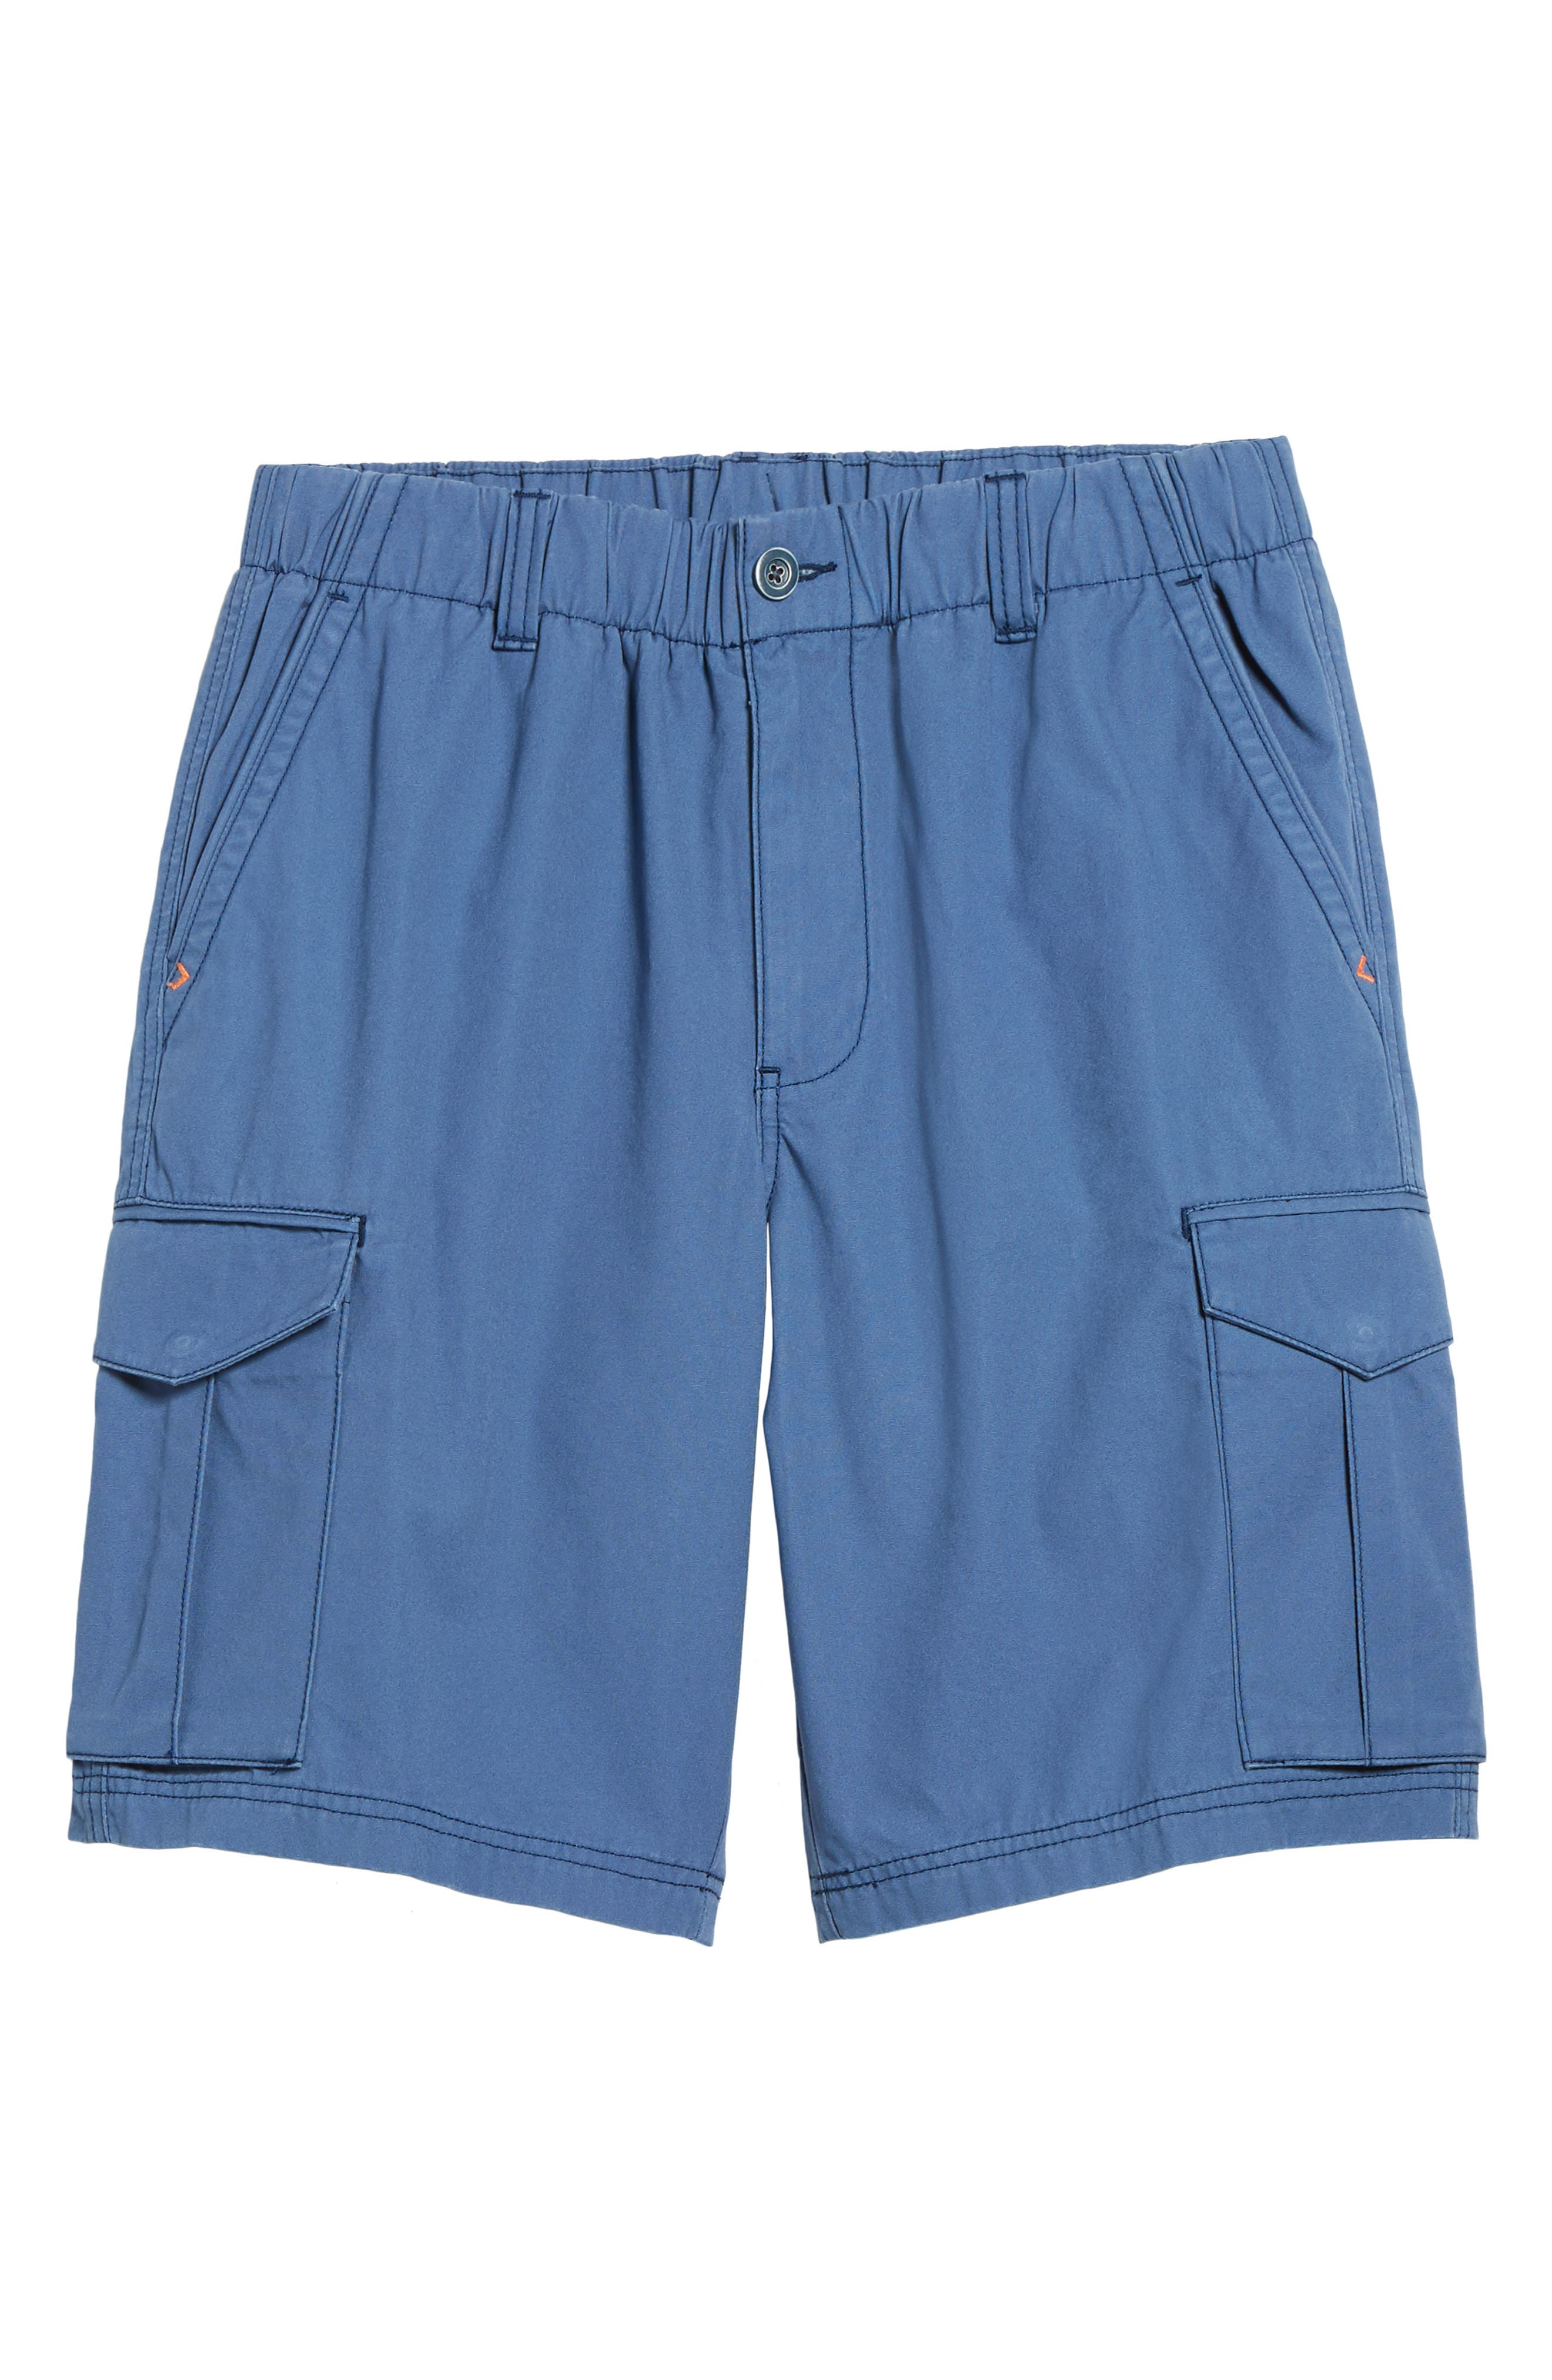 Island Survivalist Cargo Shorts,                             Alternate thumbnail 6, color,                             Dockside Blue